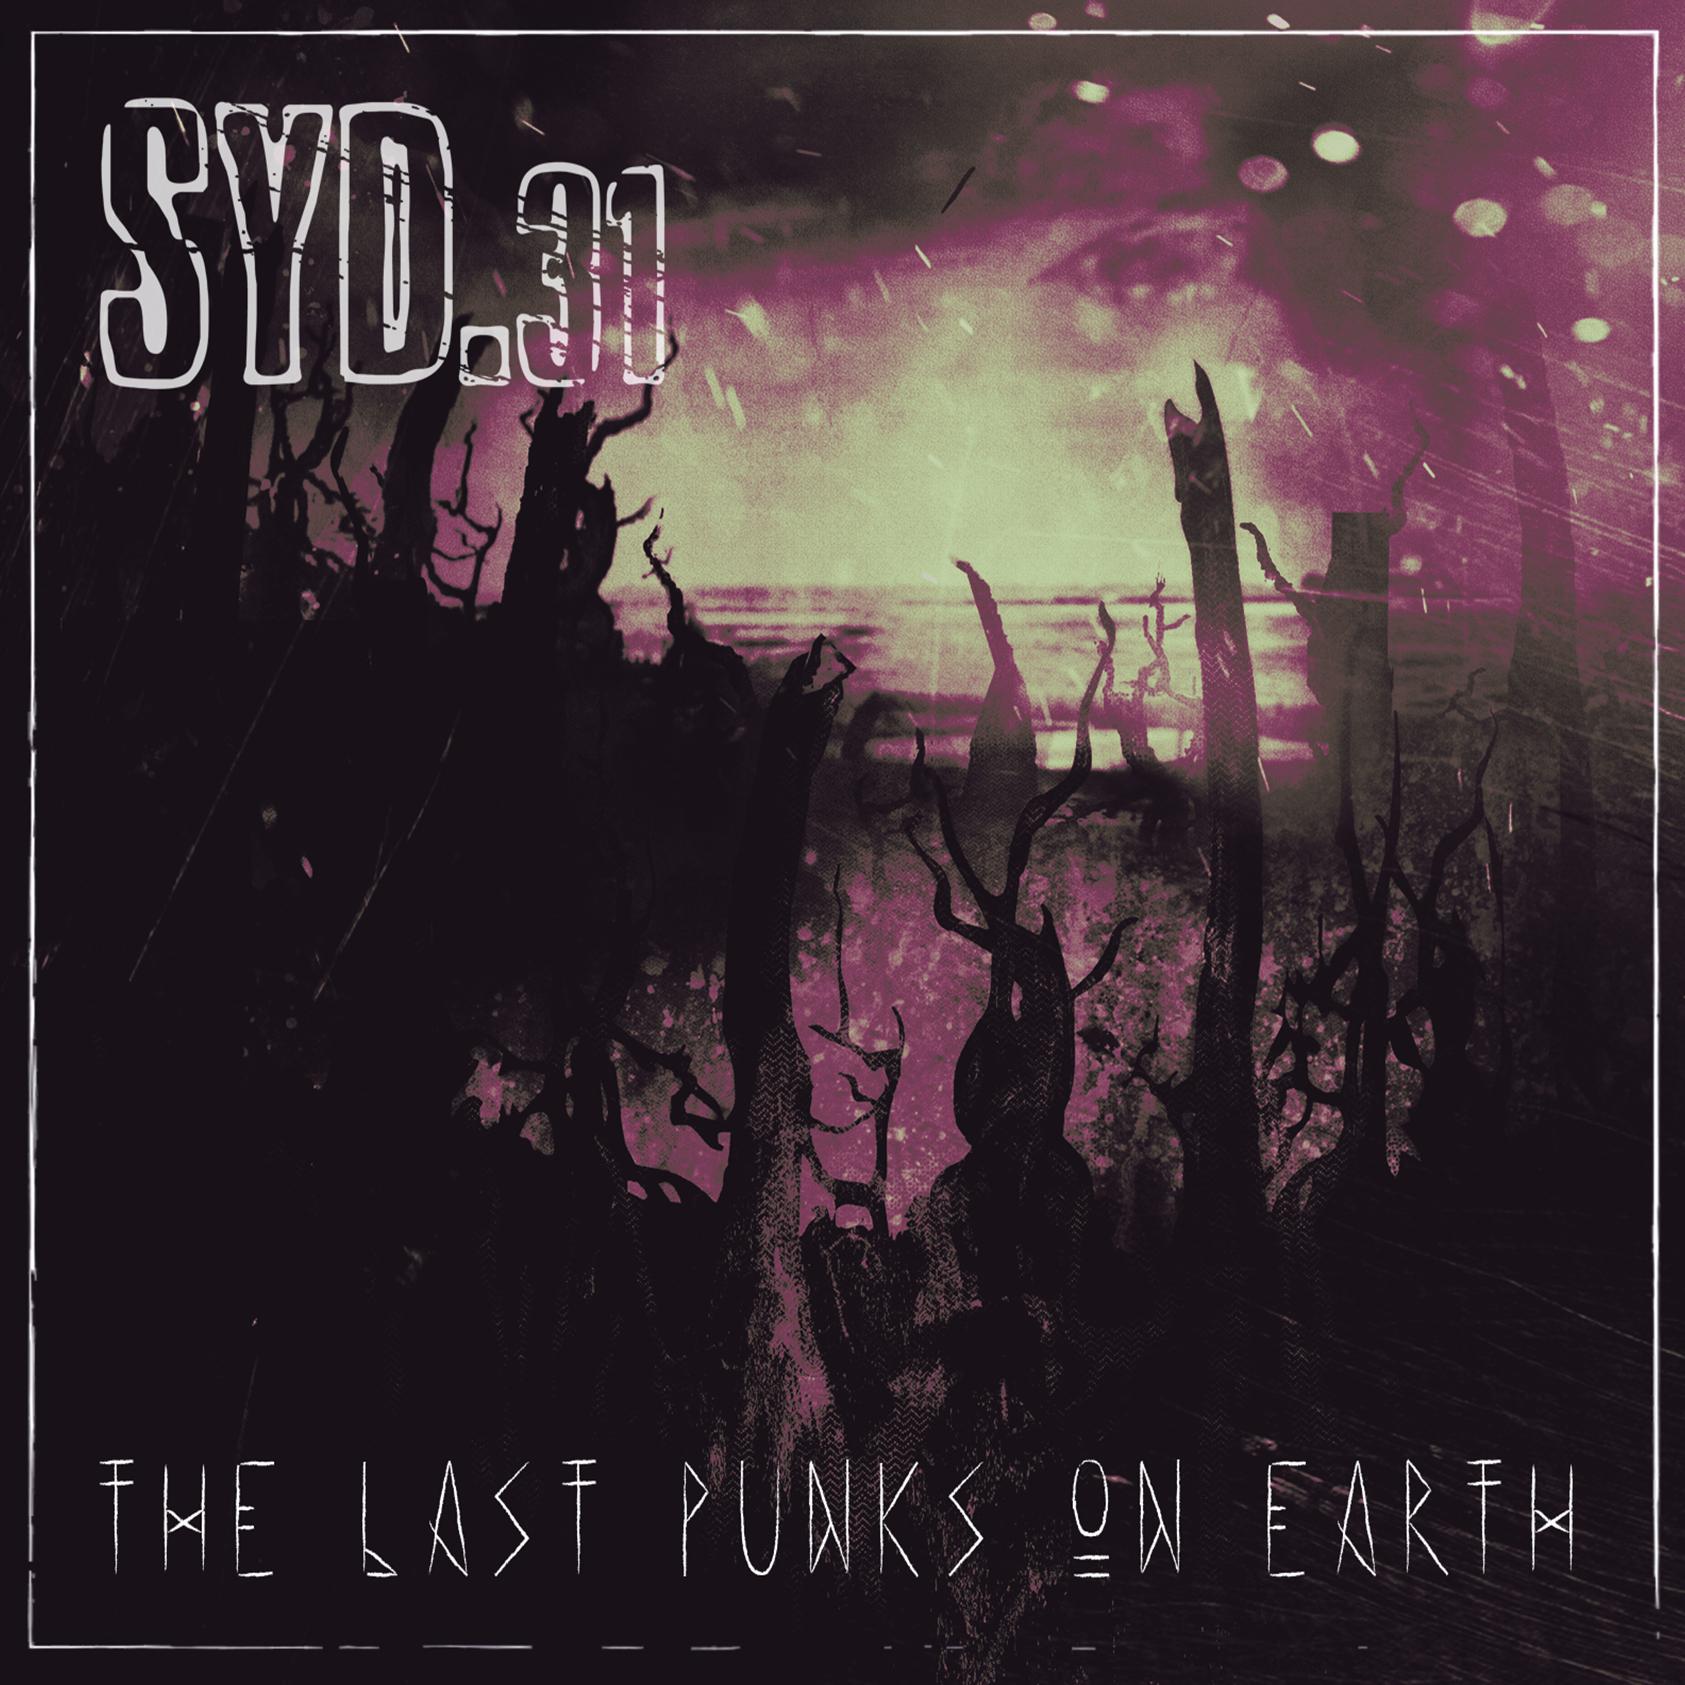 Syd.31 - The Last Punks on Earth